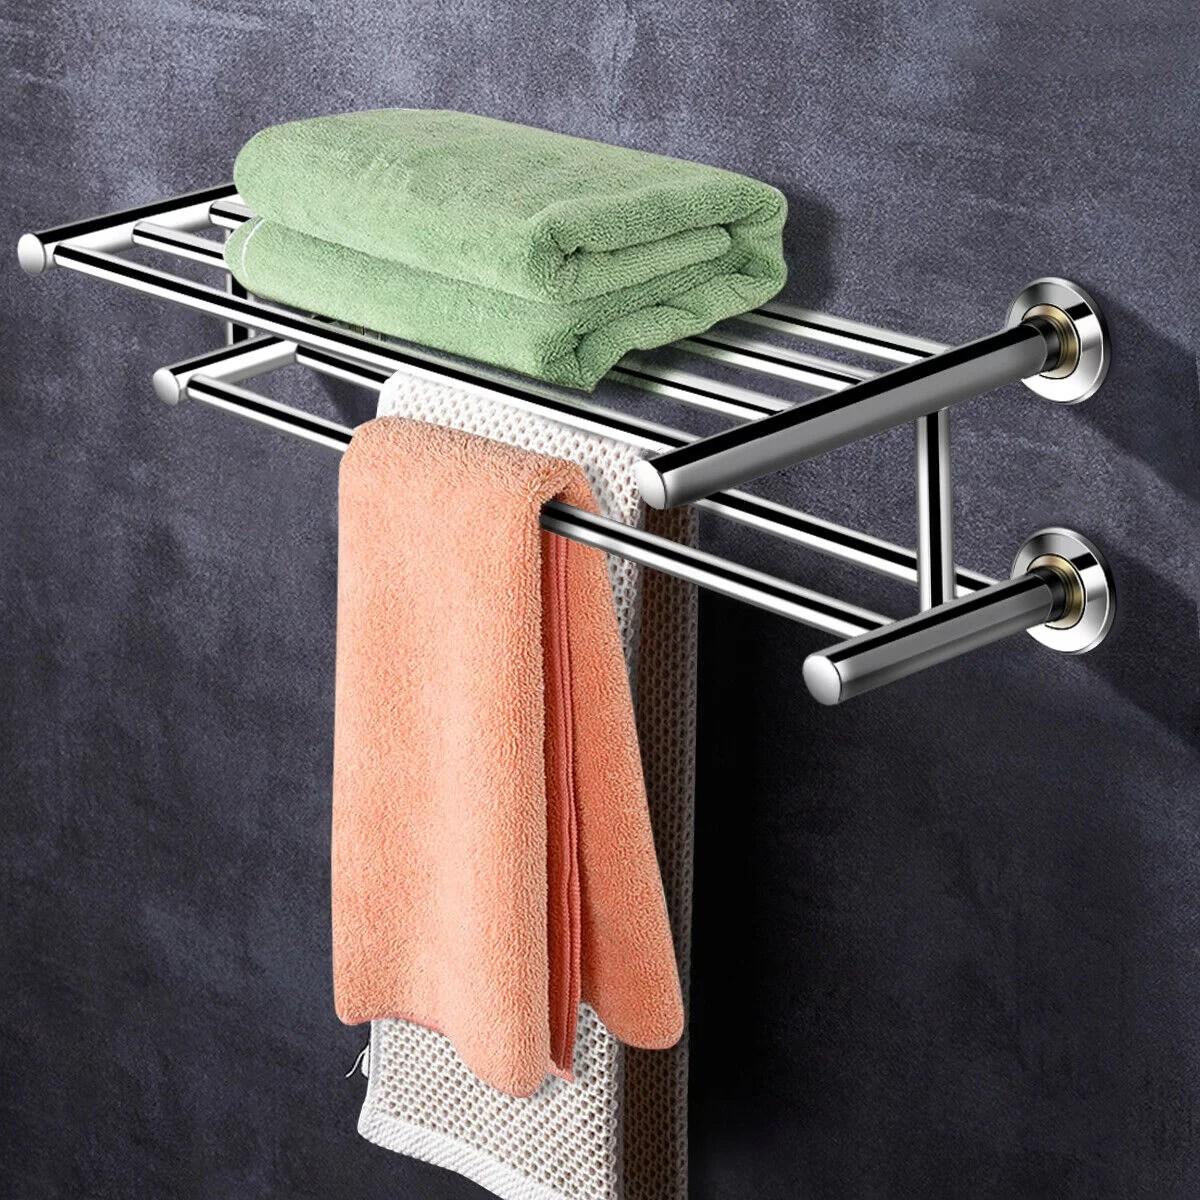 costway porte serviettes mural barres de serviette support de serviette salle de bain en acier inoxydable 201